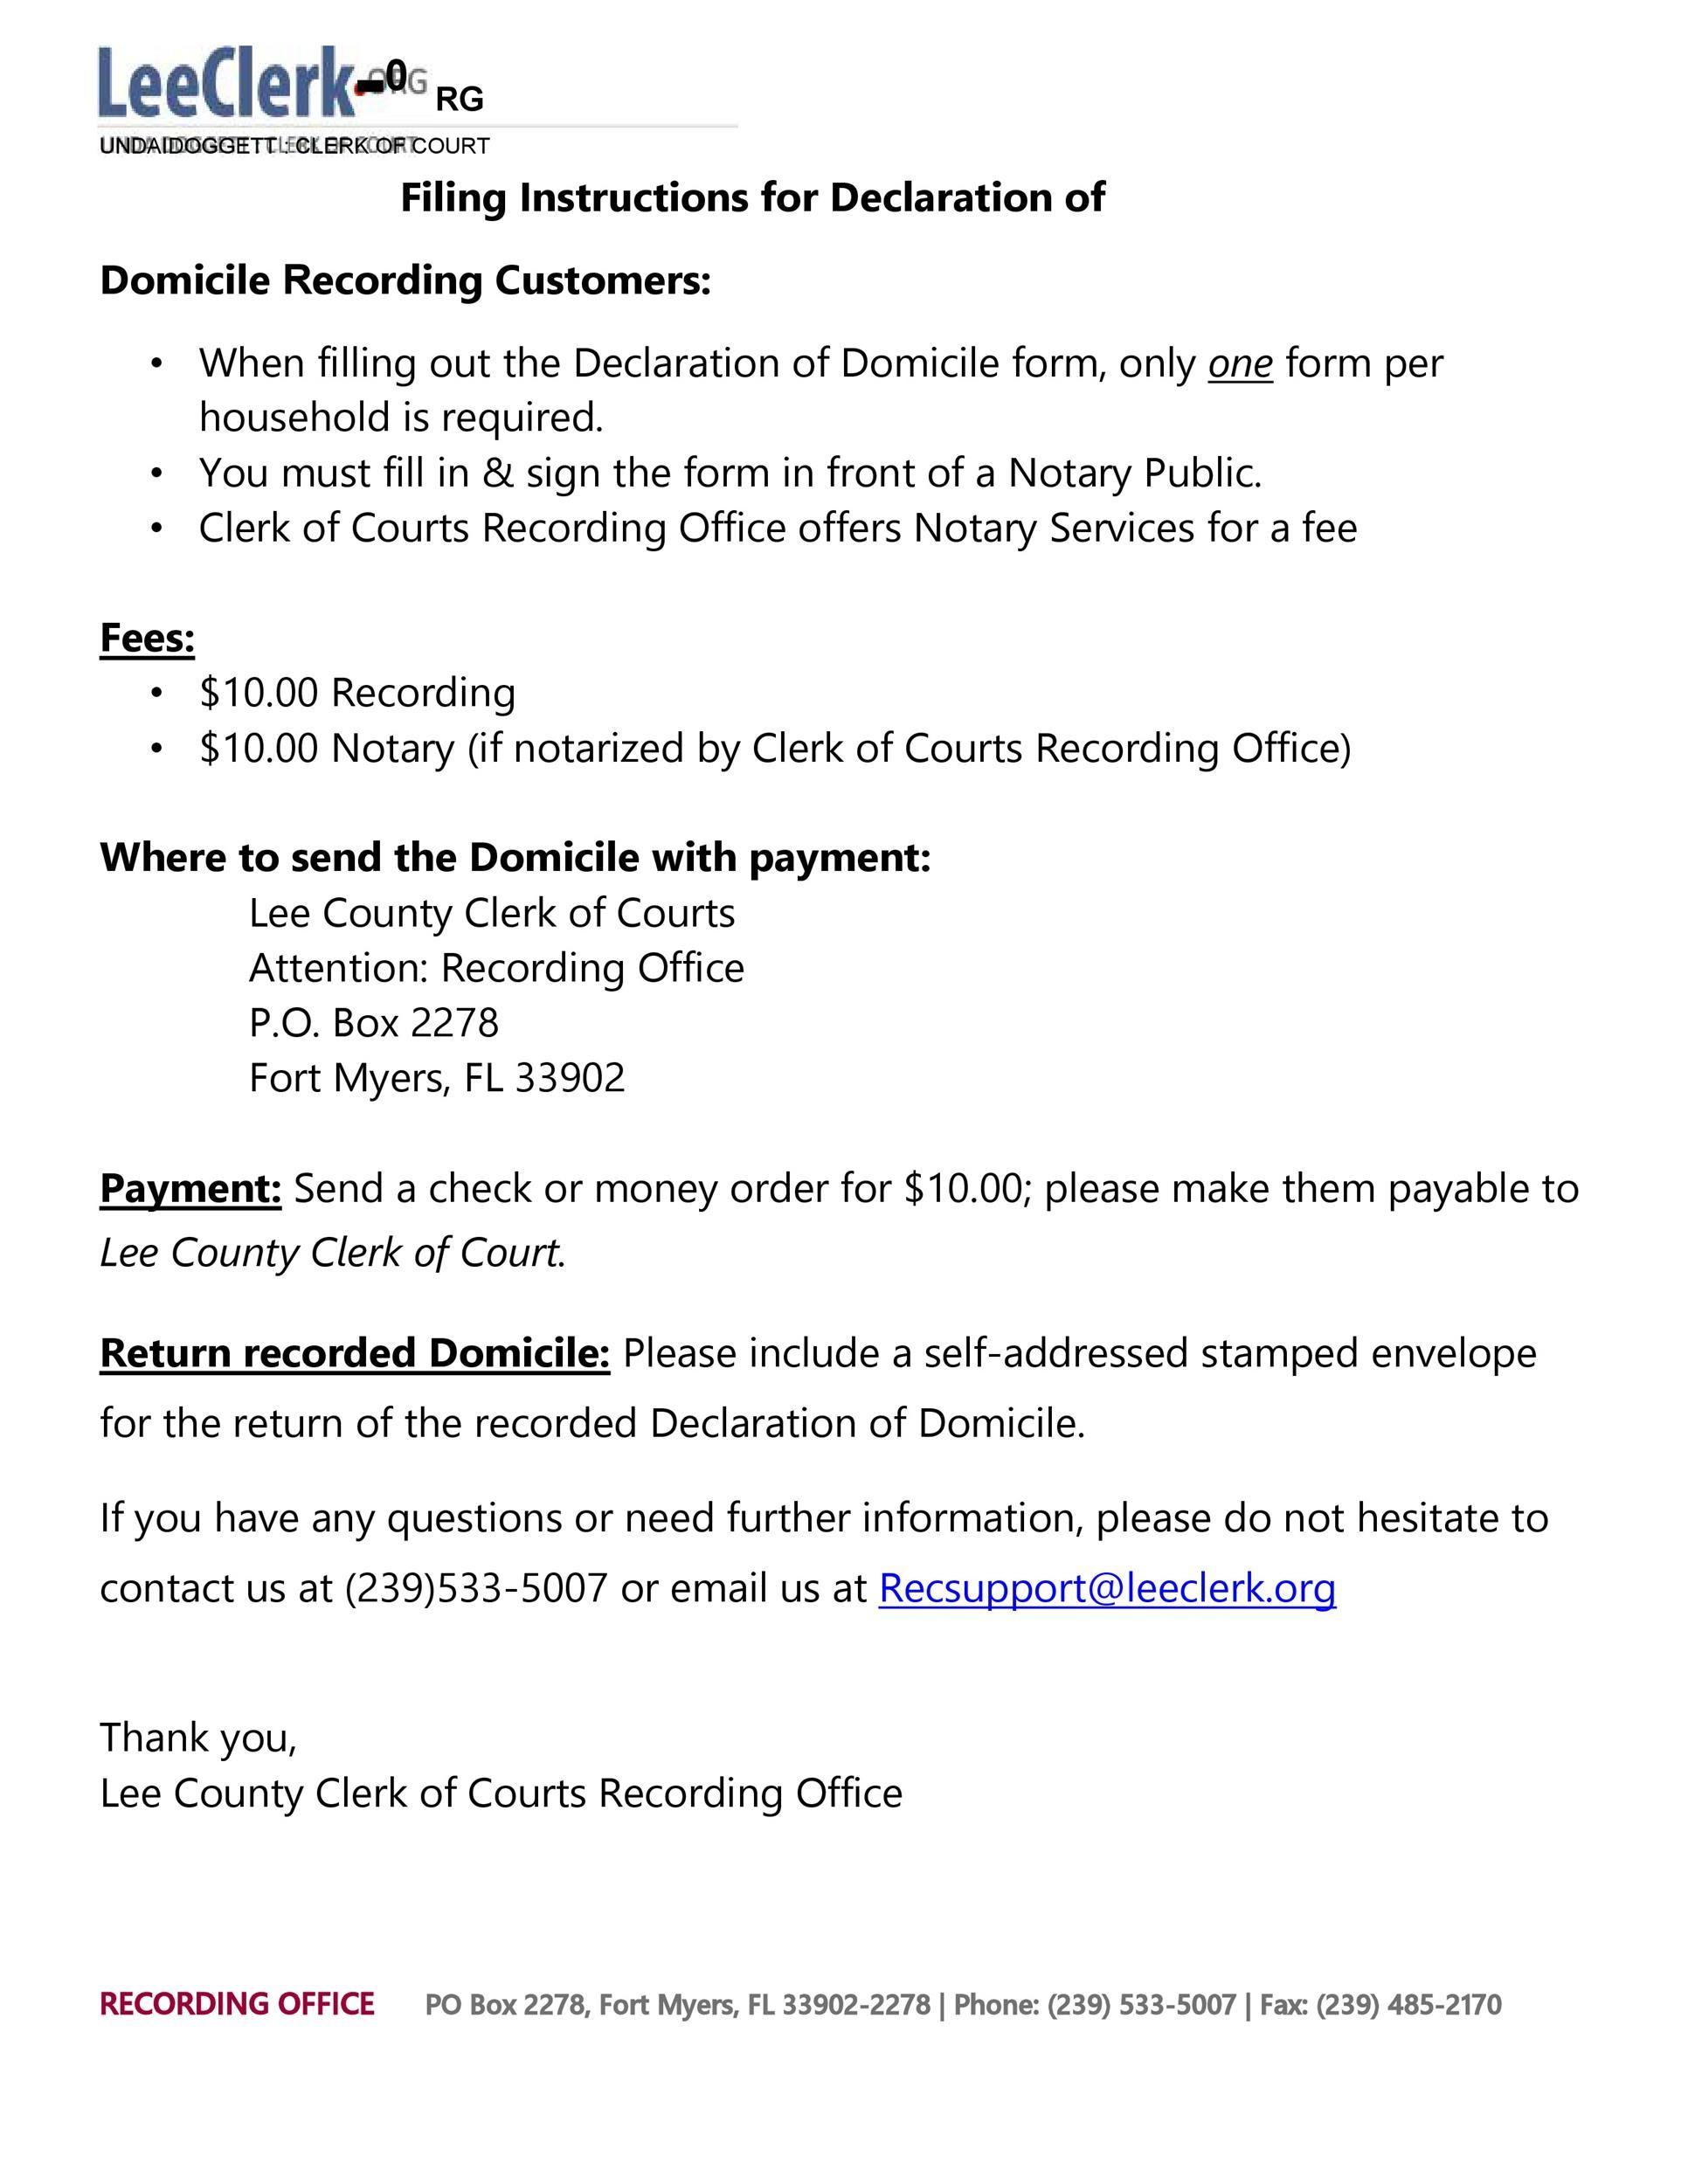 Free affidavit of domicile 22